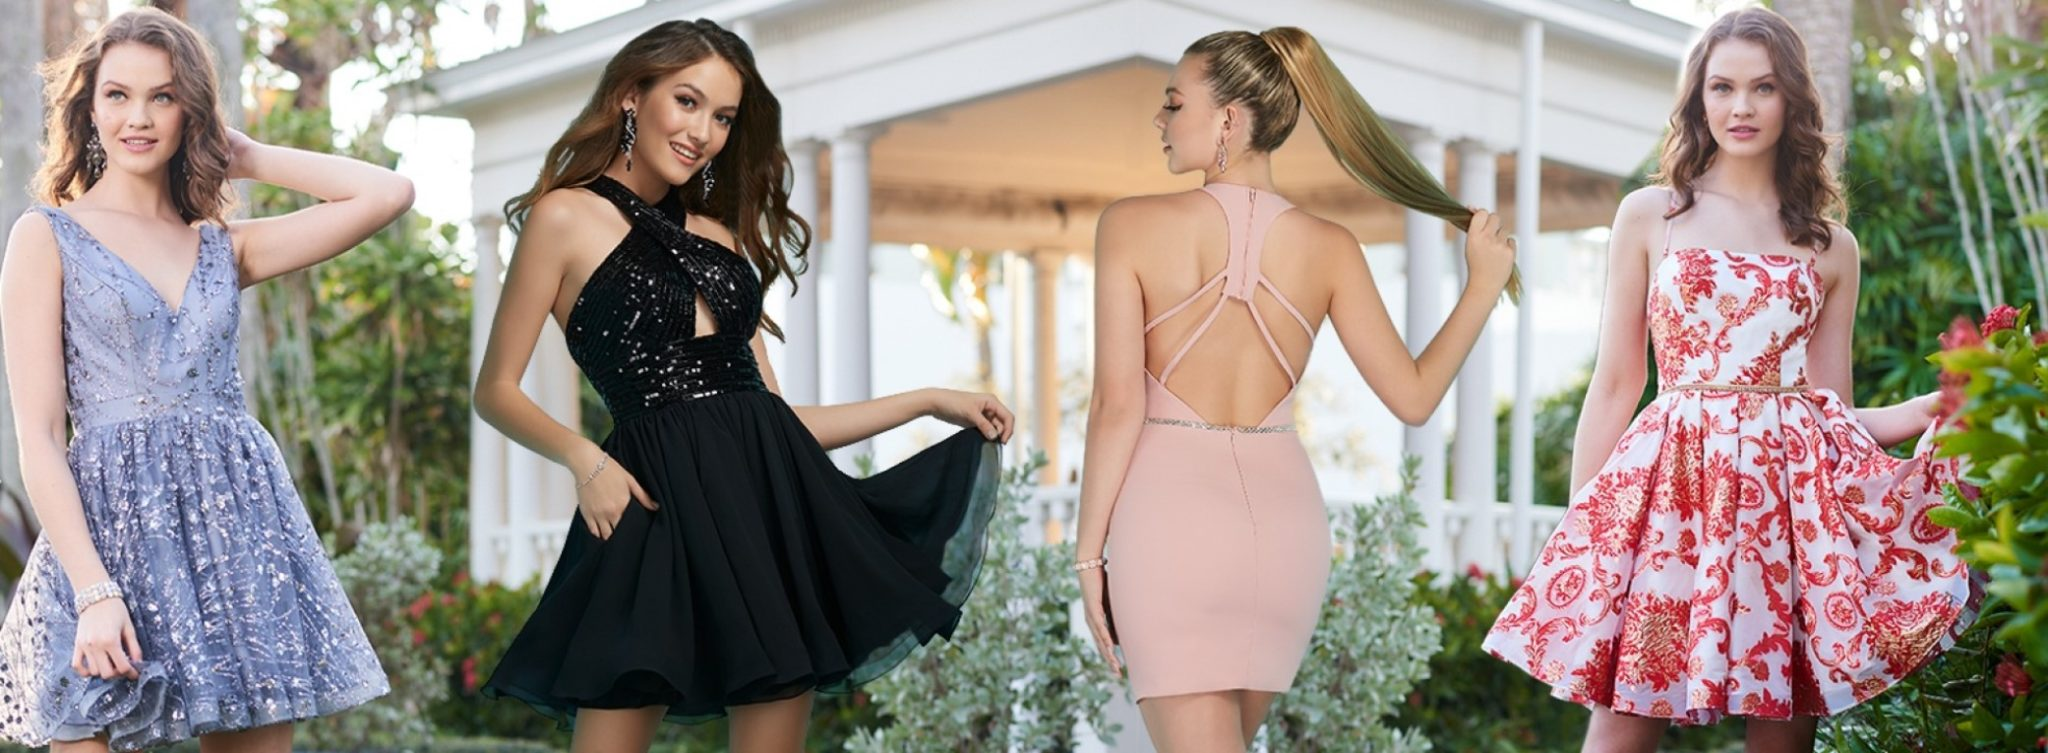 Sarasota Wedding Dresses, Quinceanera, Homecoming, Prom